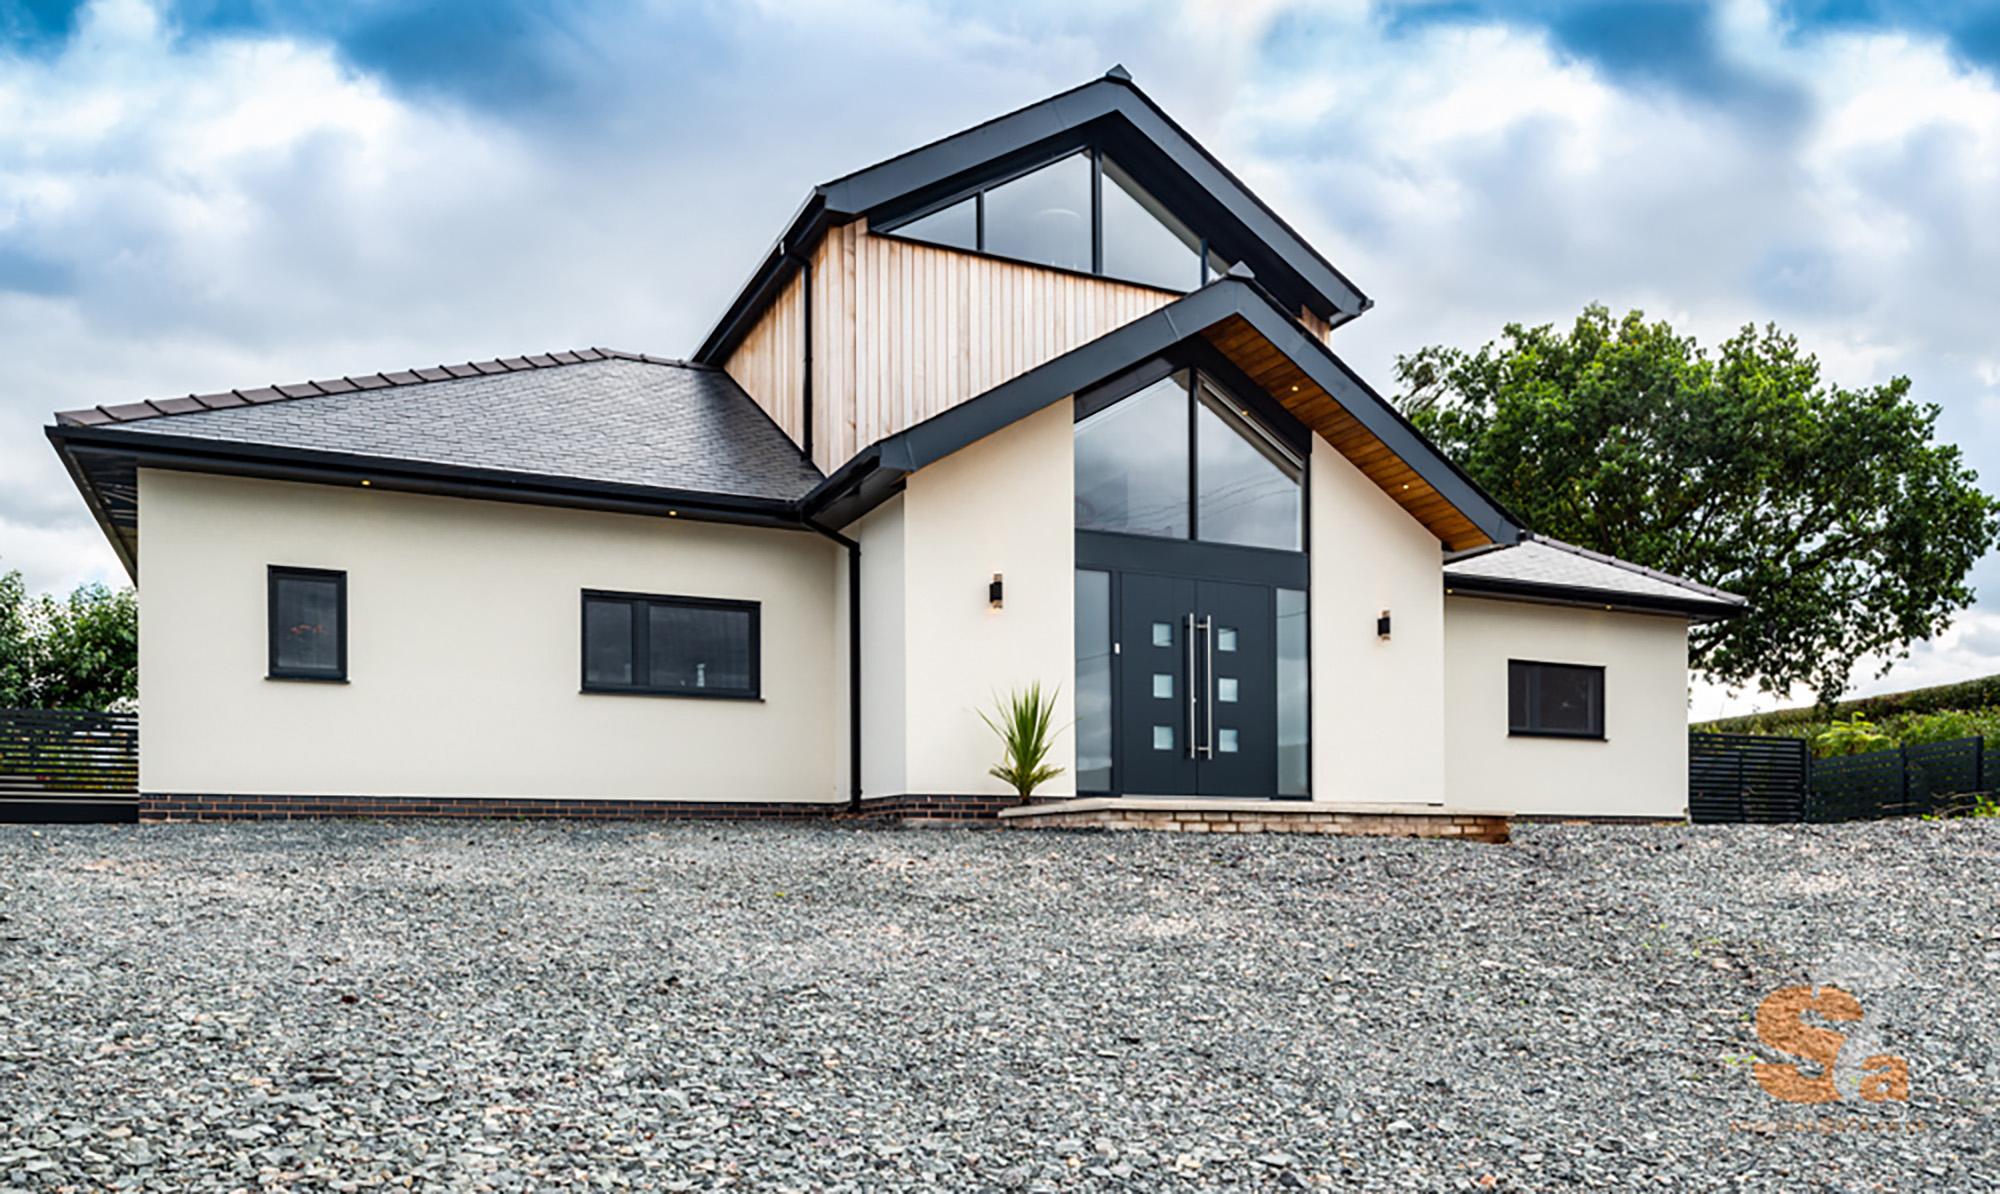 studio-severn-architects-shropshire-riba-uk-02